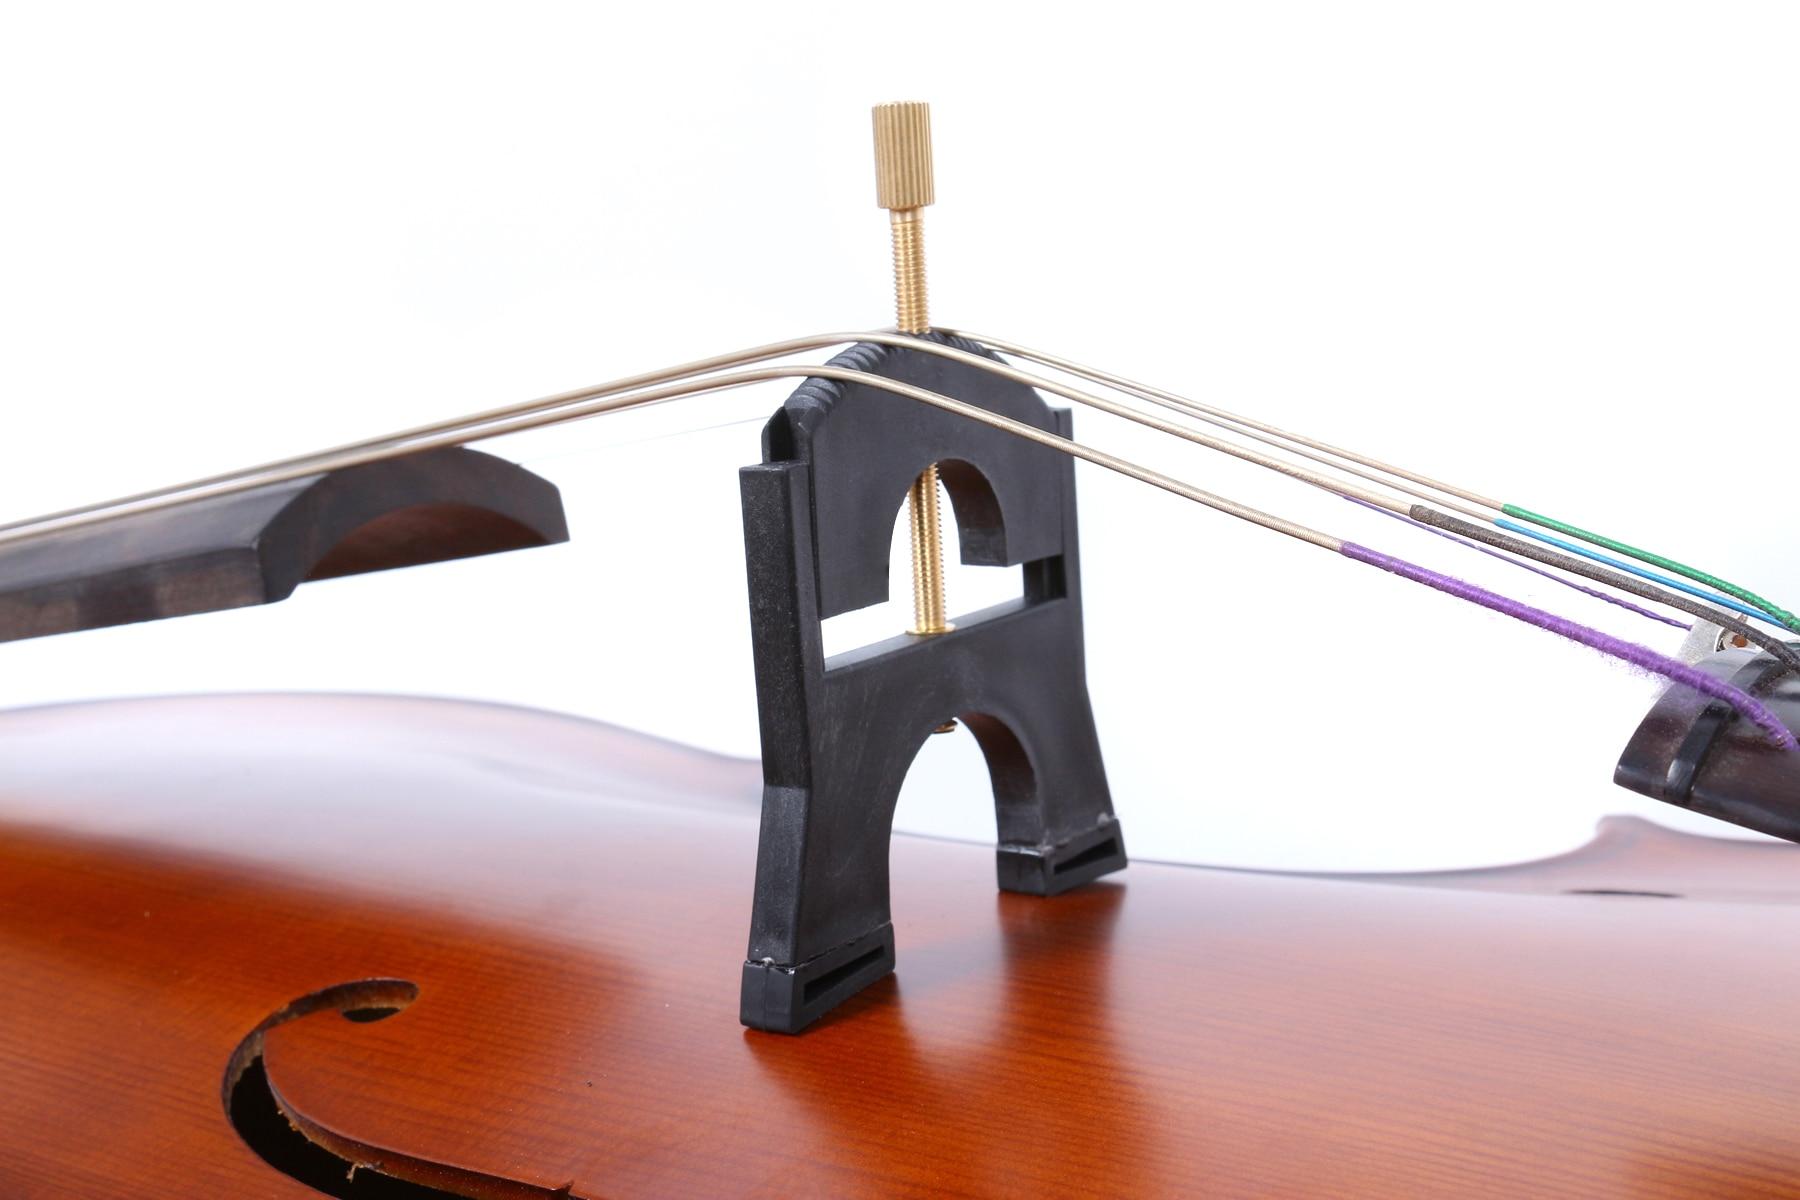 Cello String Heber 1/4-4/4 größe Cello werkzeuge Ändern Cello Brücke Langlebig